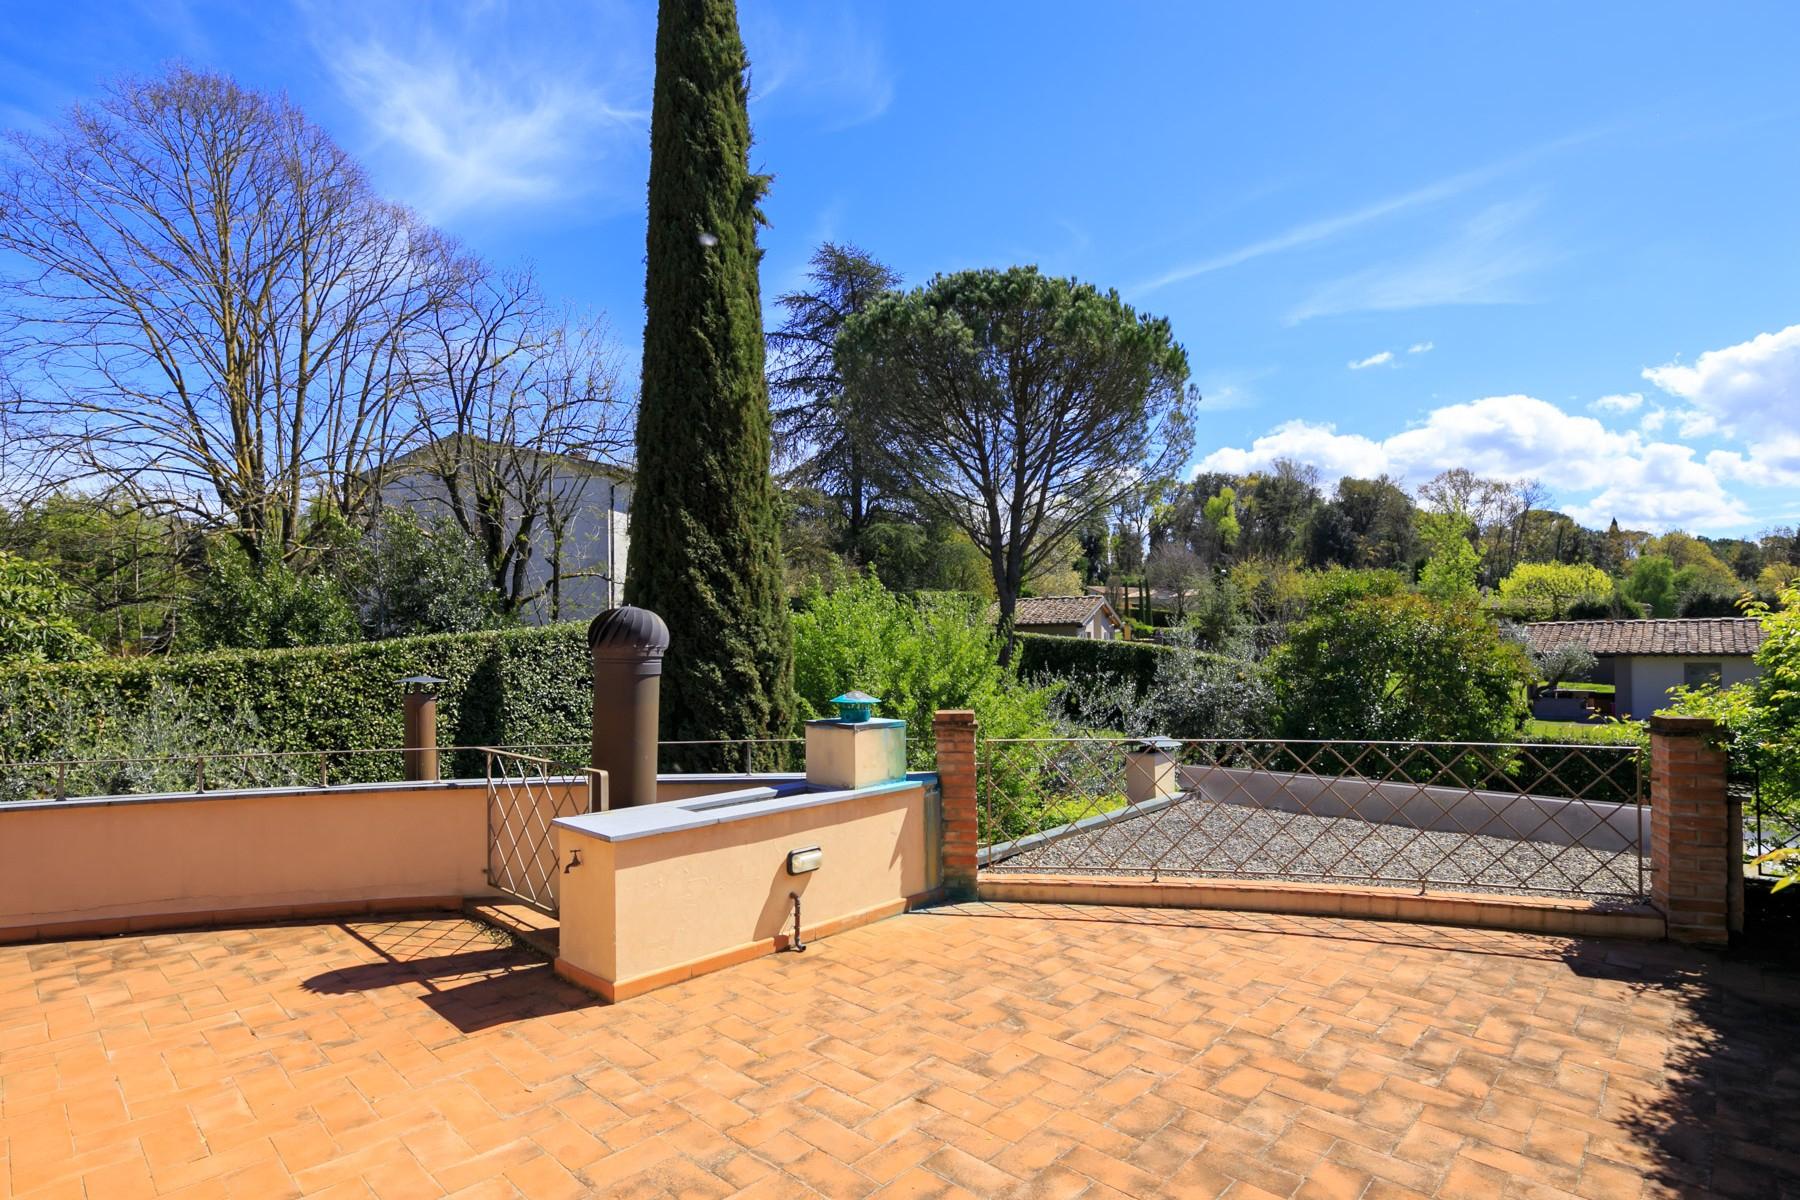 Villa in Vendita a Lucca: 5 locali, 500 mq - Foto 18